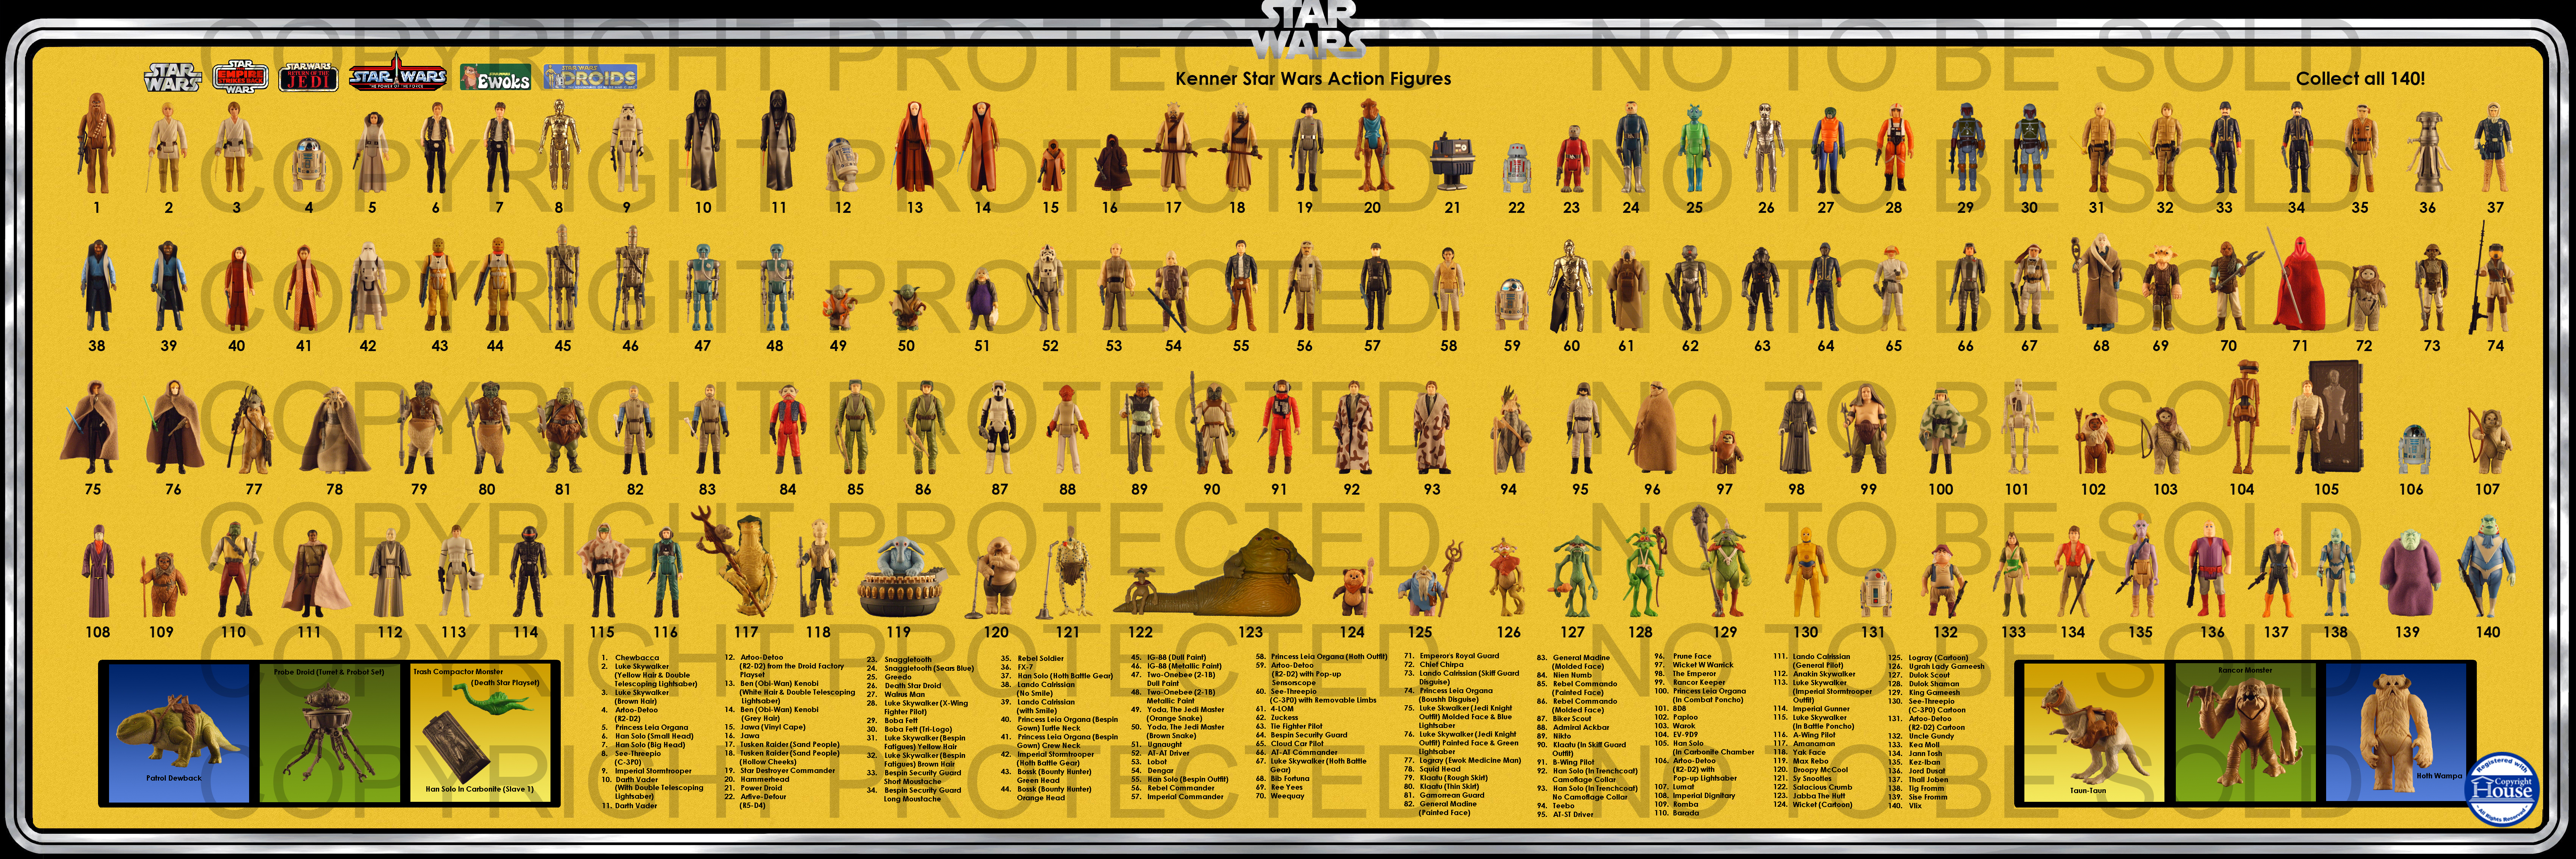 Star wars spanish stuff ver tema cuantas figuras - Star wars spanish stuff ...